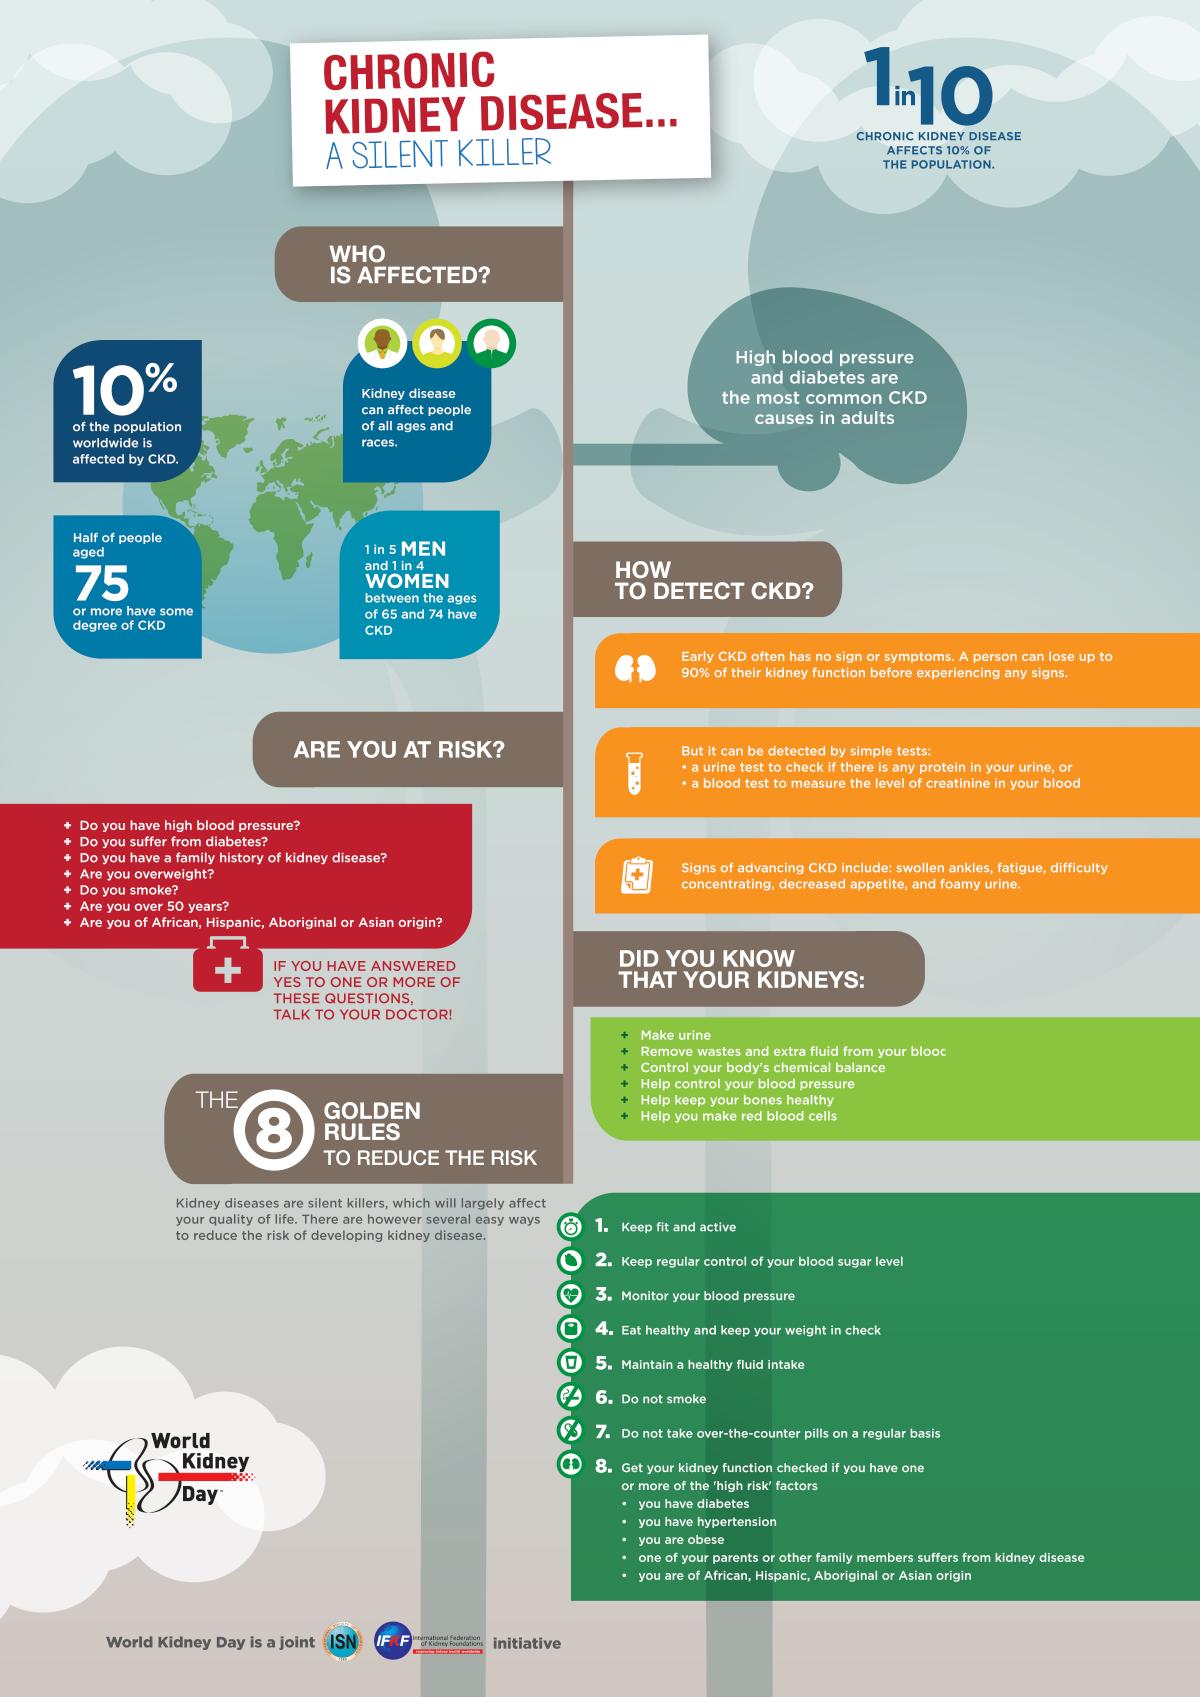 Chronic Kidney Disease Infographic - World Kidney Day